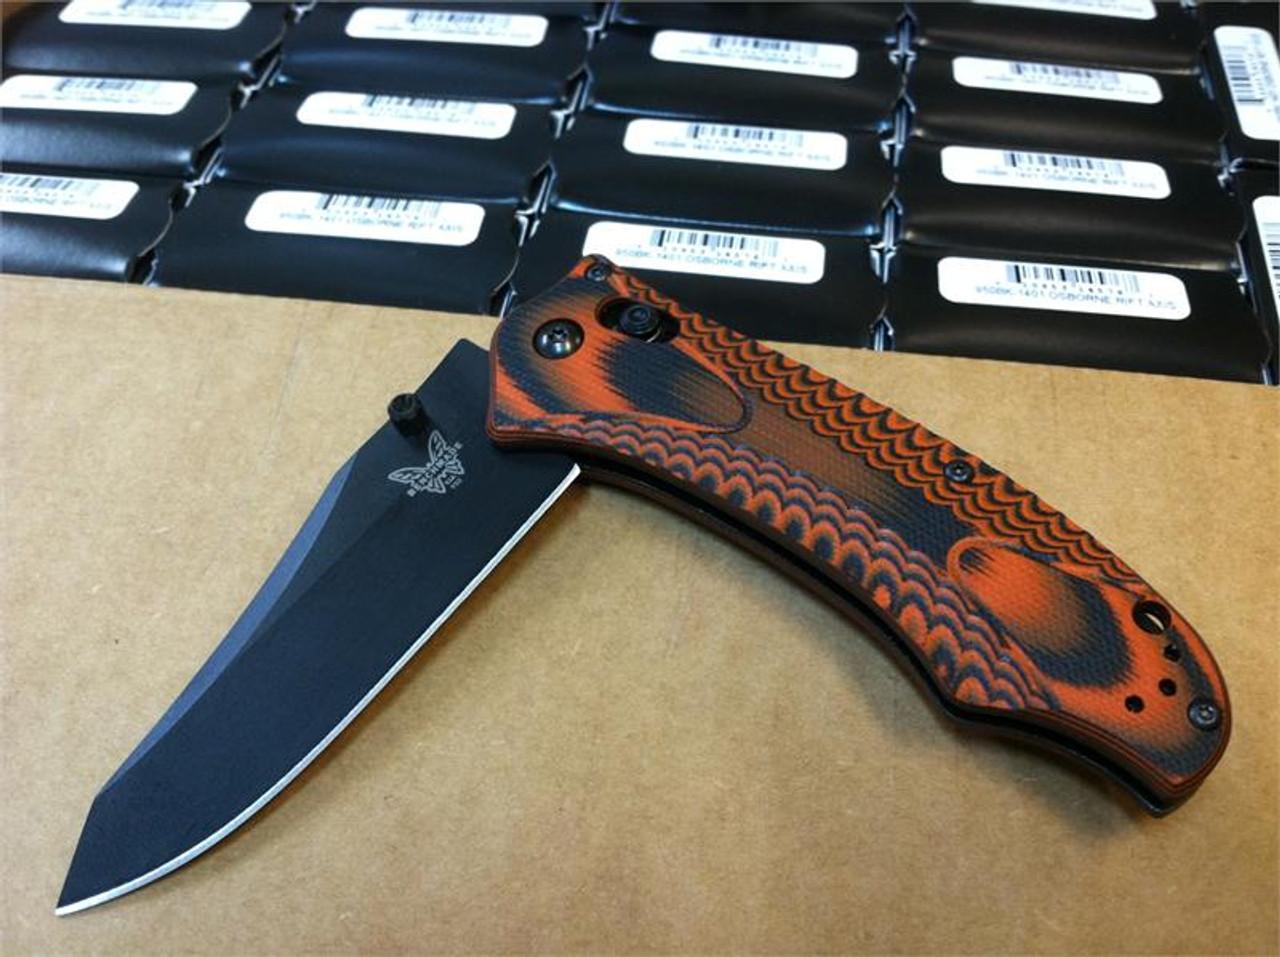 Benchmade 950BK-1401 Osborne AXIS Rift - Layered Black/Orange Textured G-10  Scales - CPM-S30V Plain Edge Blade BK1 Black - CUTLERY SHOPPE EXCLUSIVE -